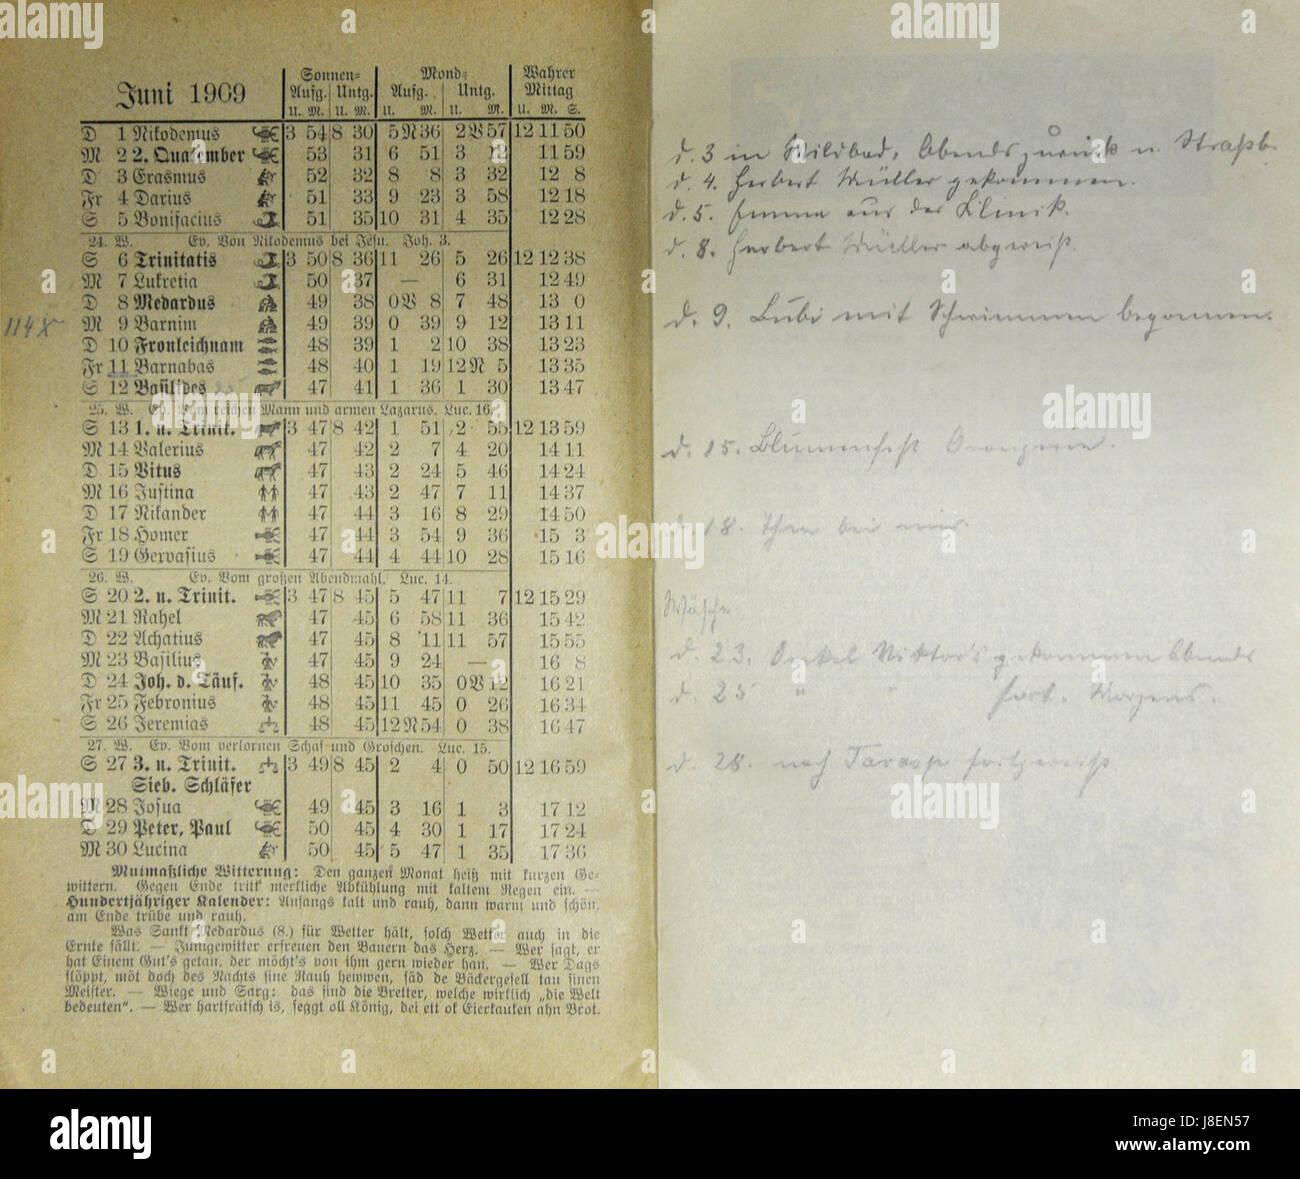 Mecklenburgischer Kalender 1909 013 Stock Photo